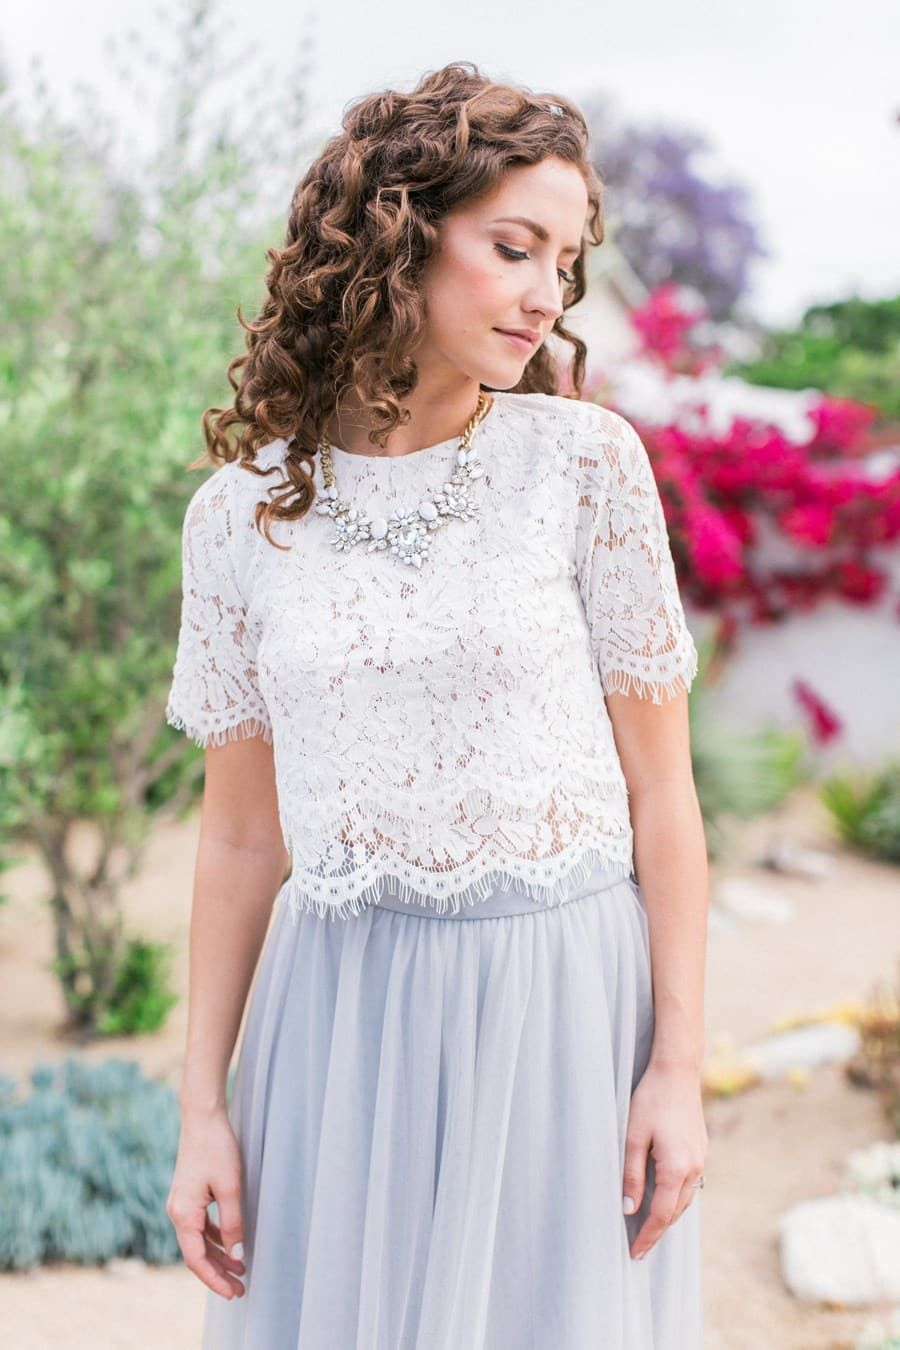 D 555413 Lace Top Outfits Bridesmaid Dresses Lace Top Lace Tops [ 1350 x 900 Pixel ]